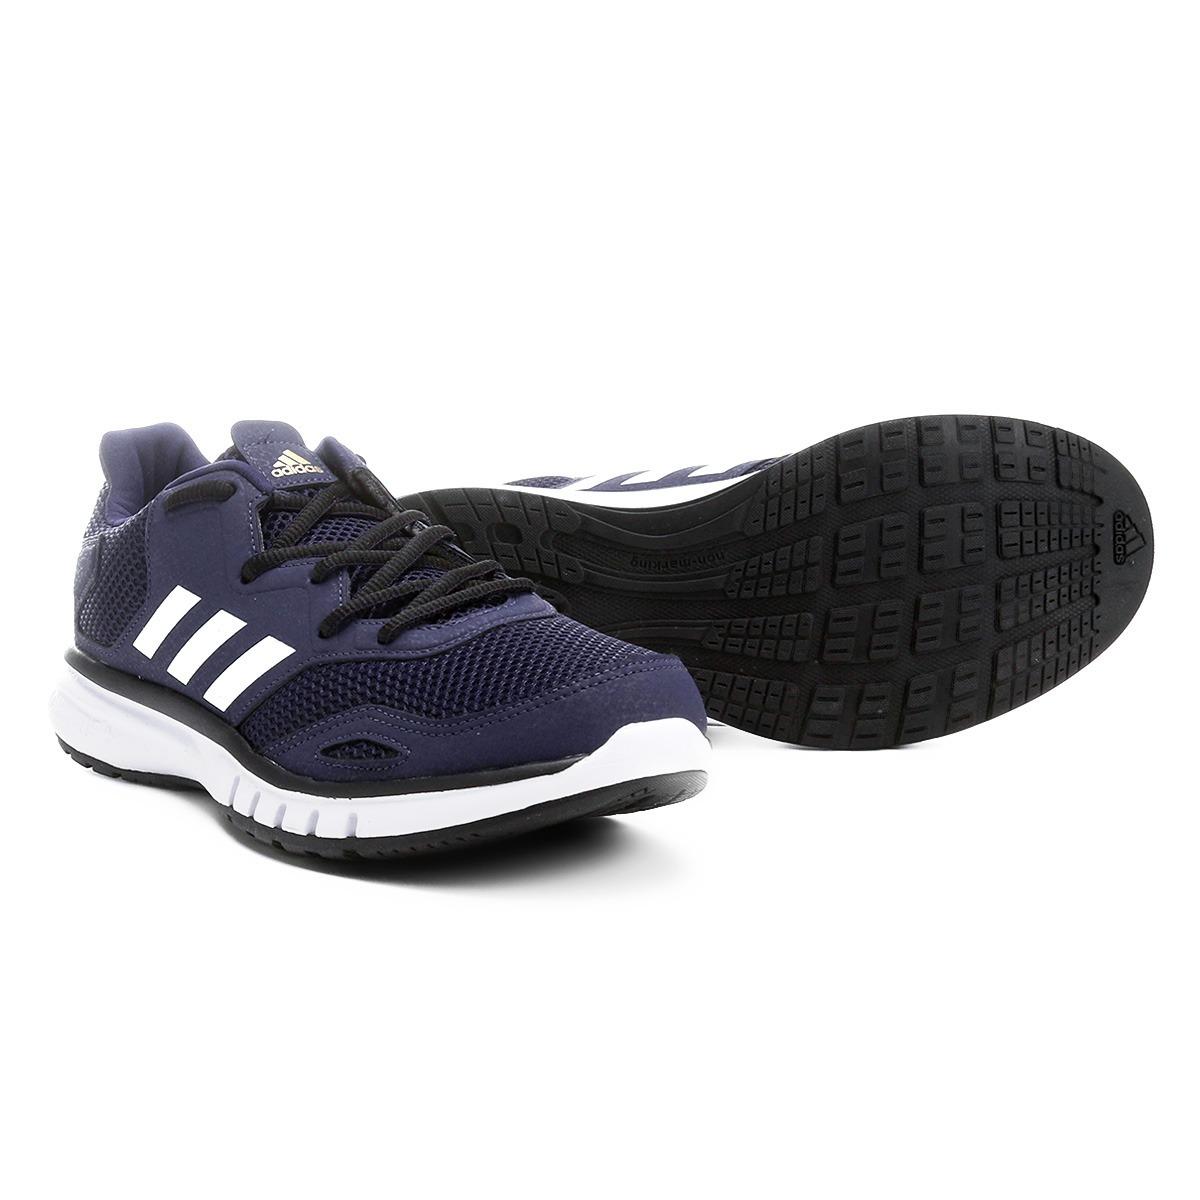 0edd6f6897 tênis adidas protostar masculino corrida academia crossfit. Carregando zoom.  classic shoes 30a5a 2d5c6 ...